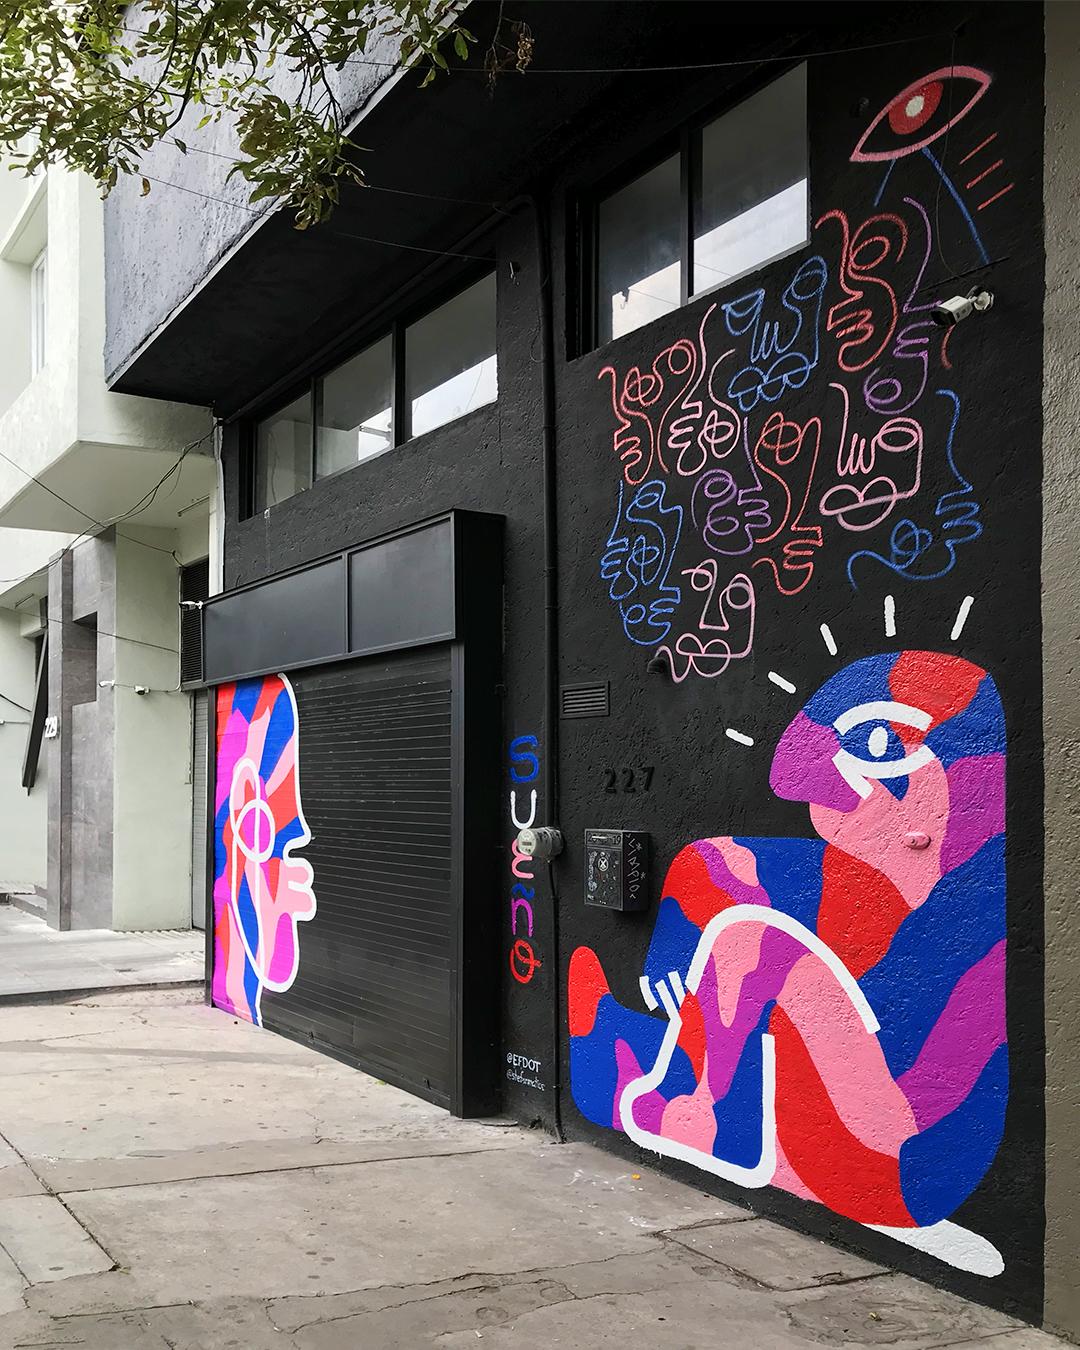 LOOT-mural-efdot–matioc-angle-crop-1-small.jpg